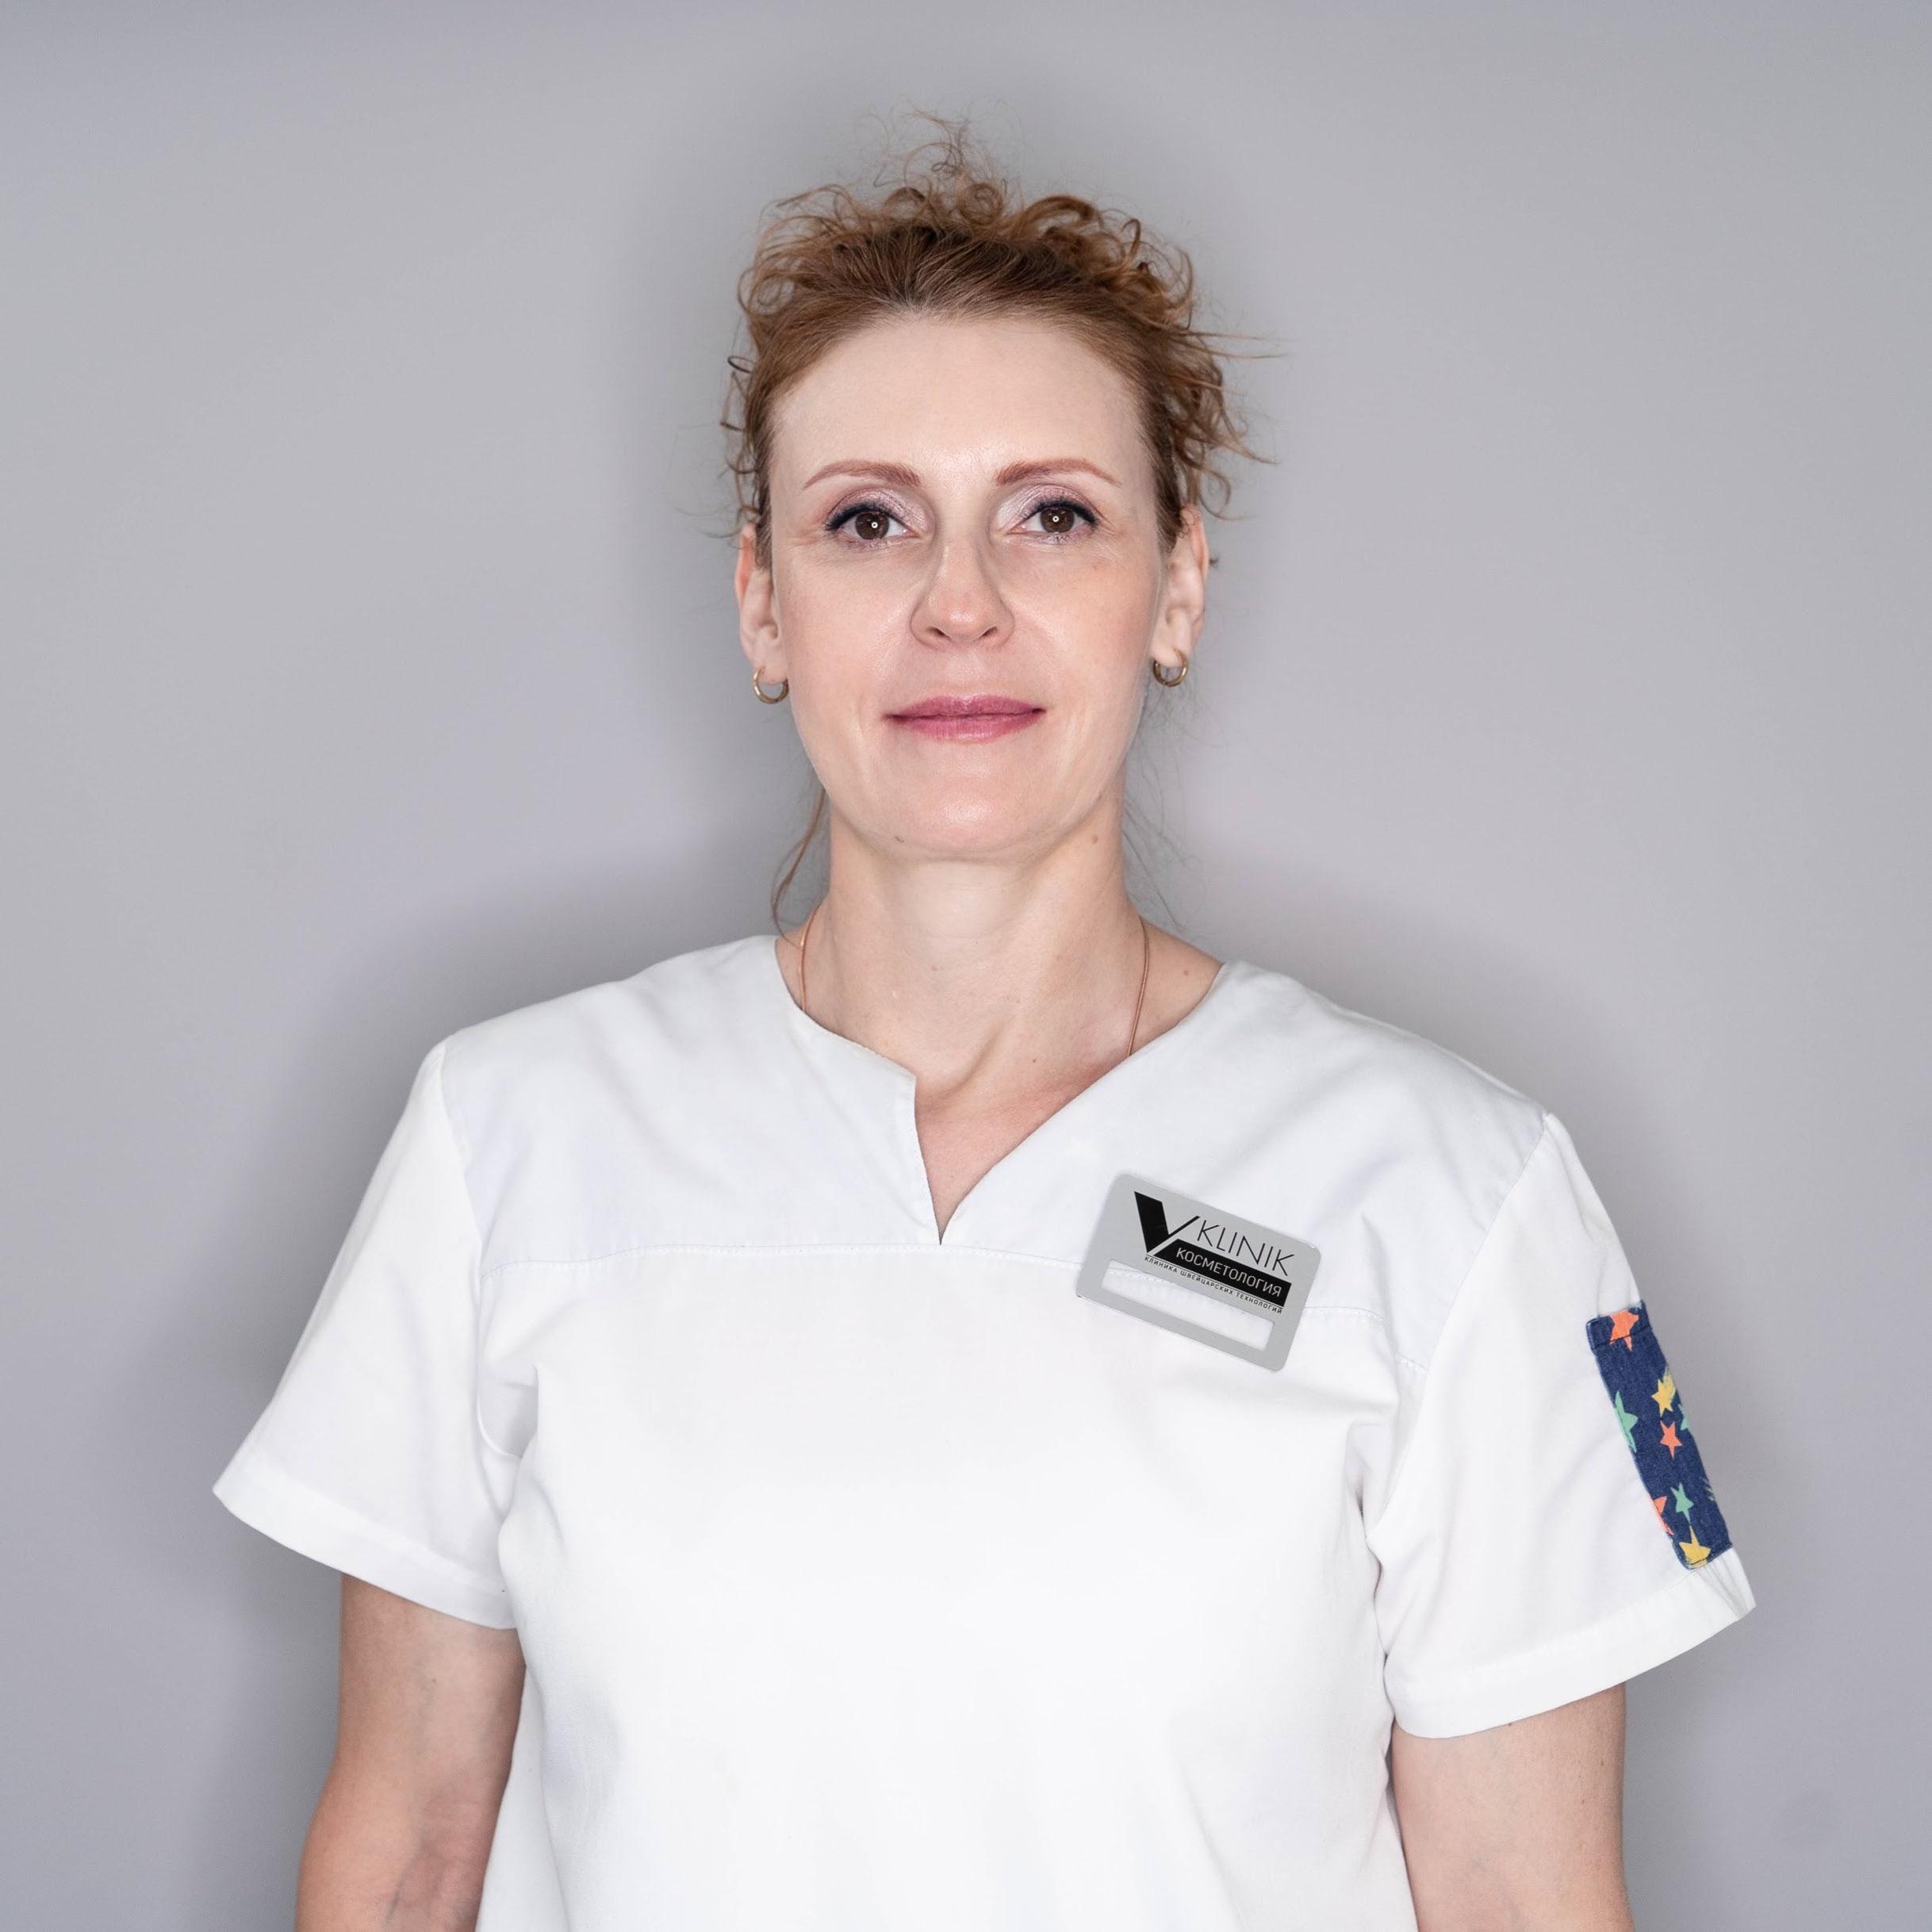 Светлана Анатольевна Сычева